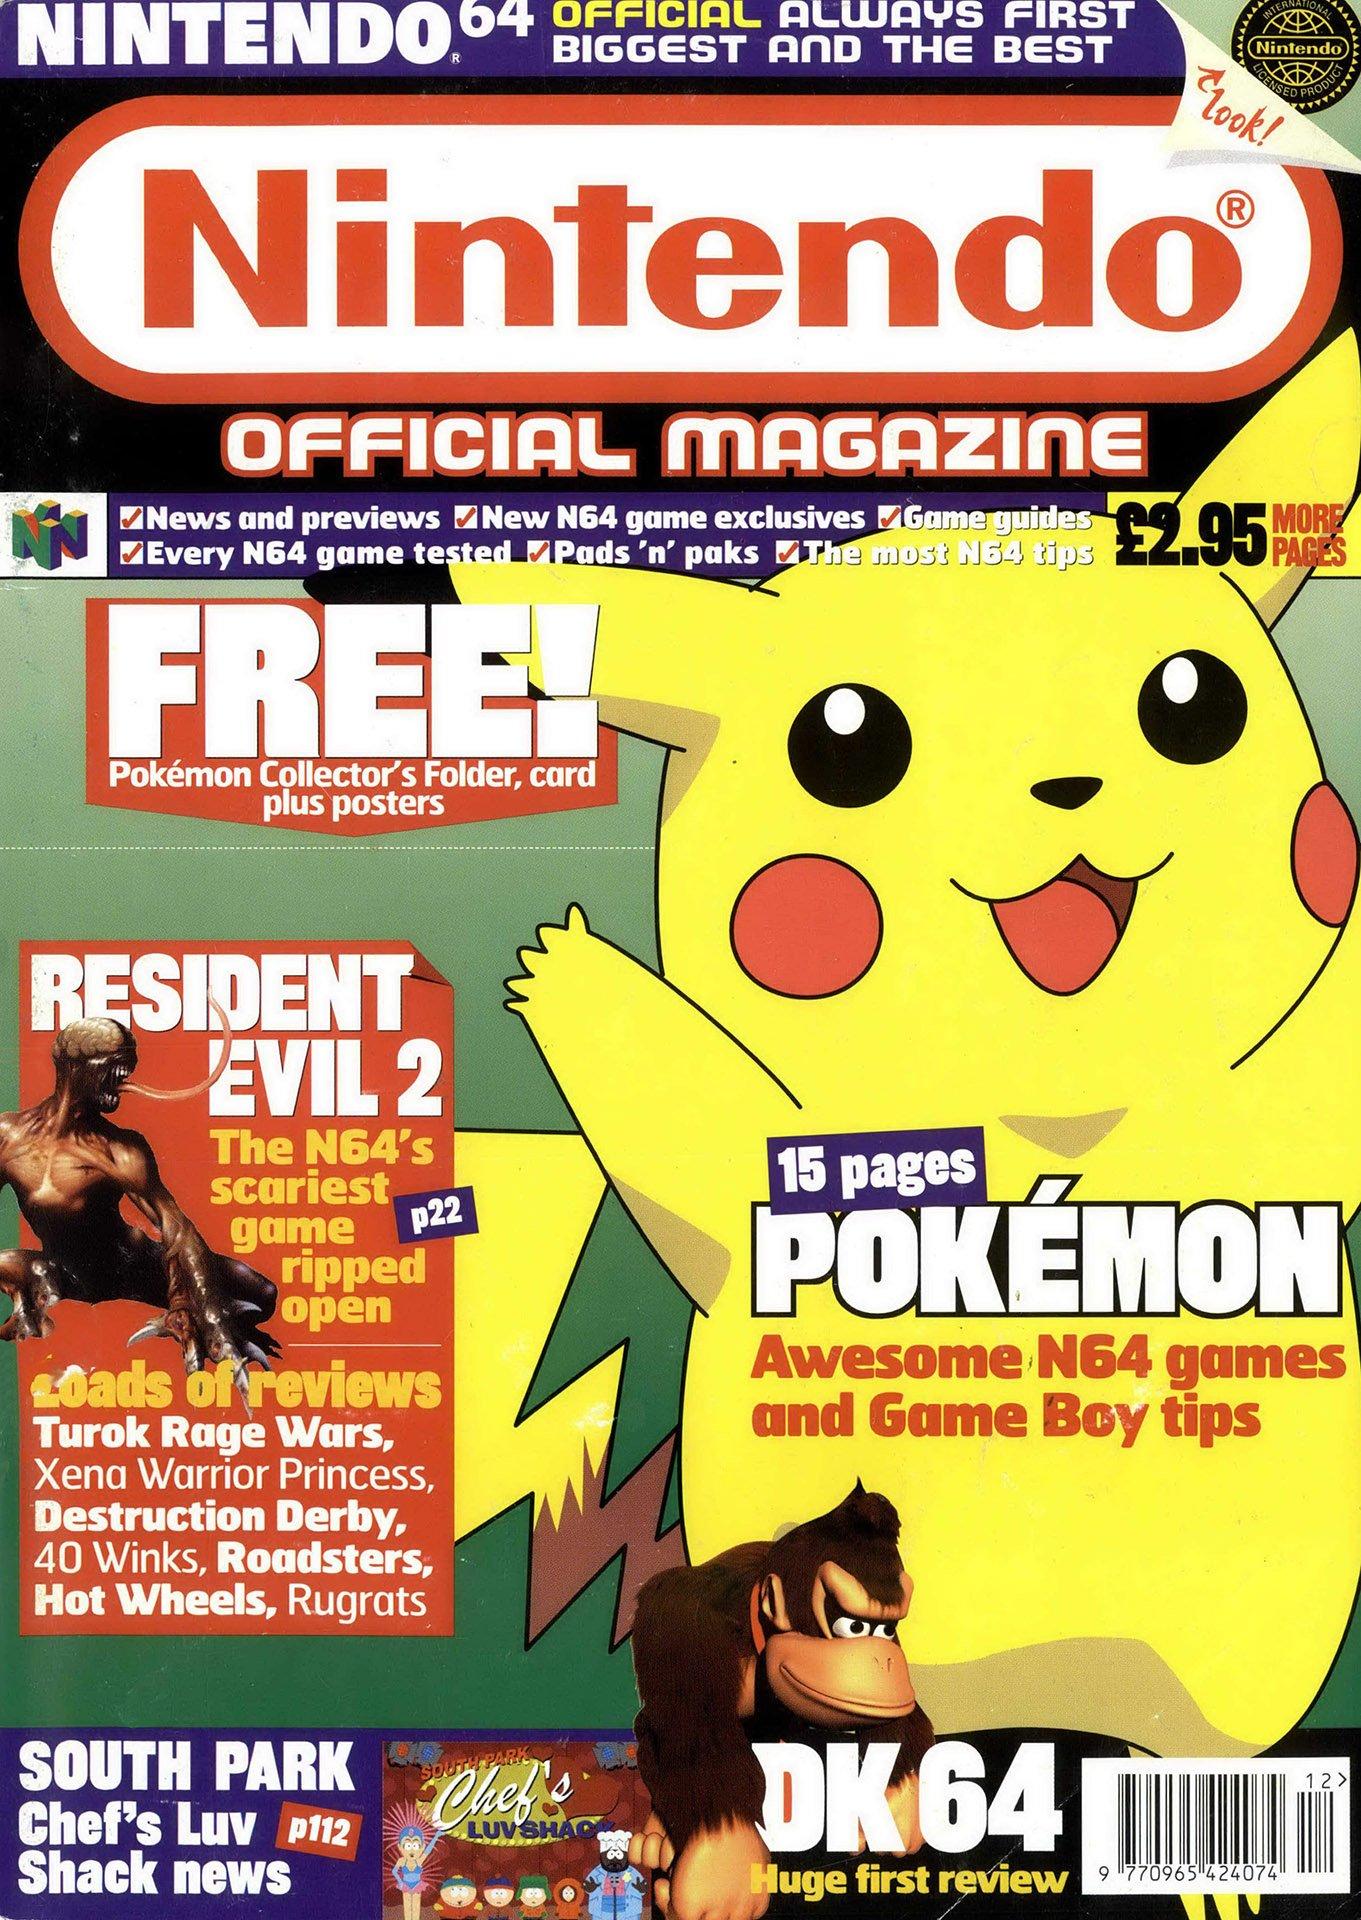 Nintendo Official Magazine 087 (December 1999)